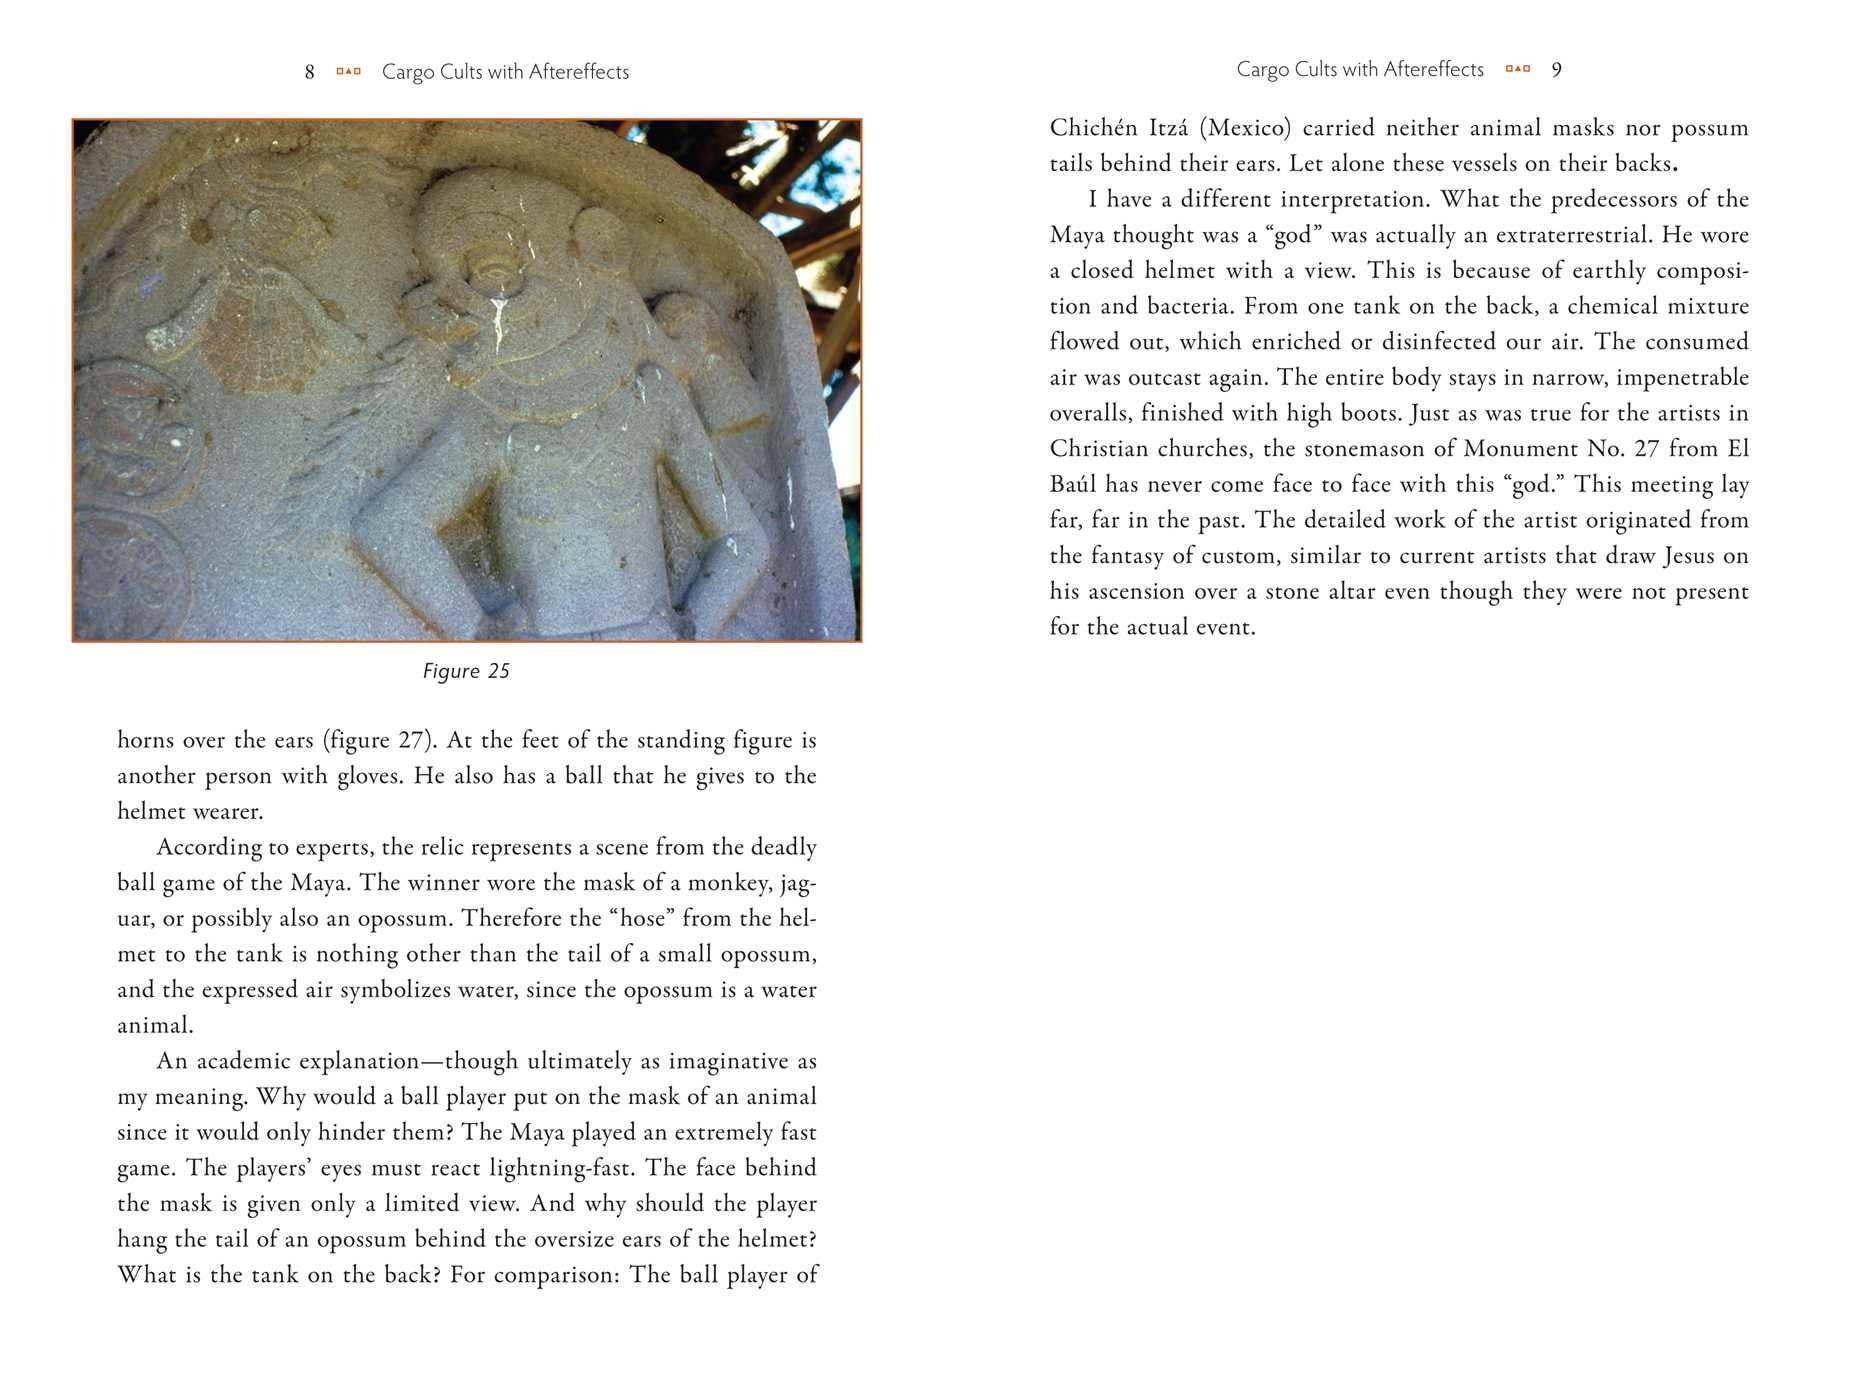 Astronaut gods of the maya 9781591432357.in04